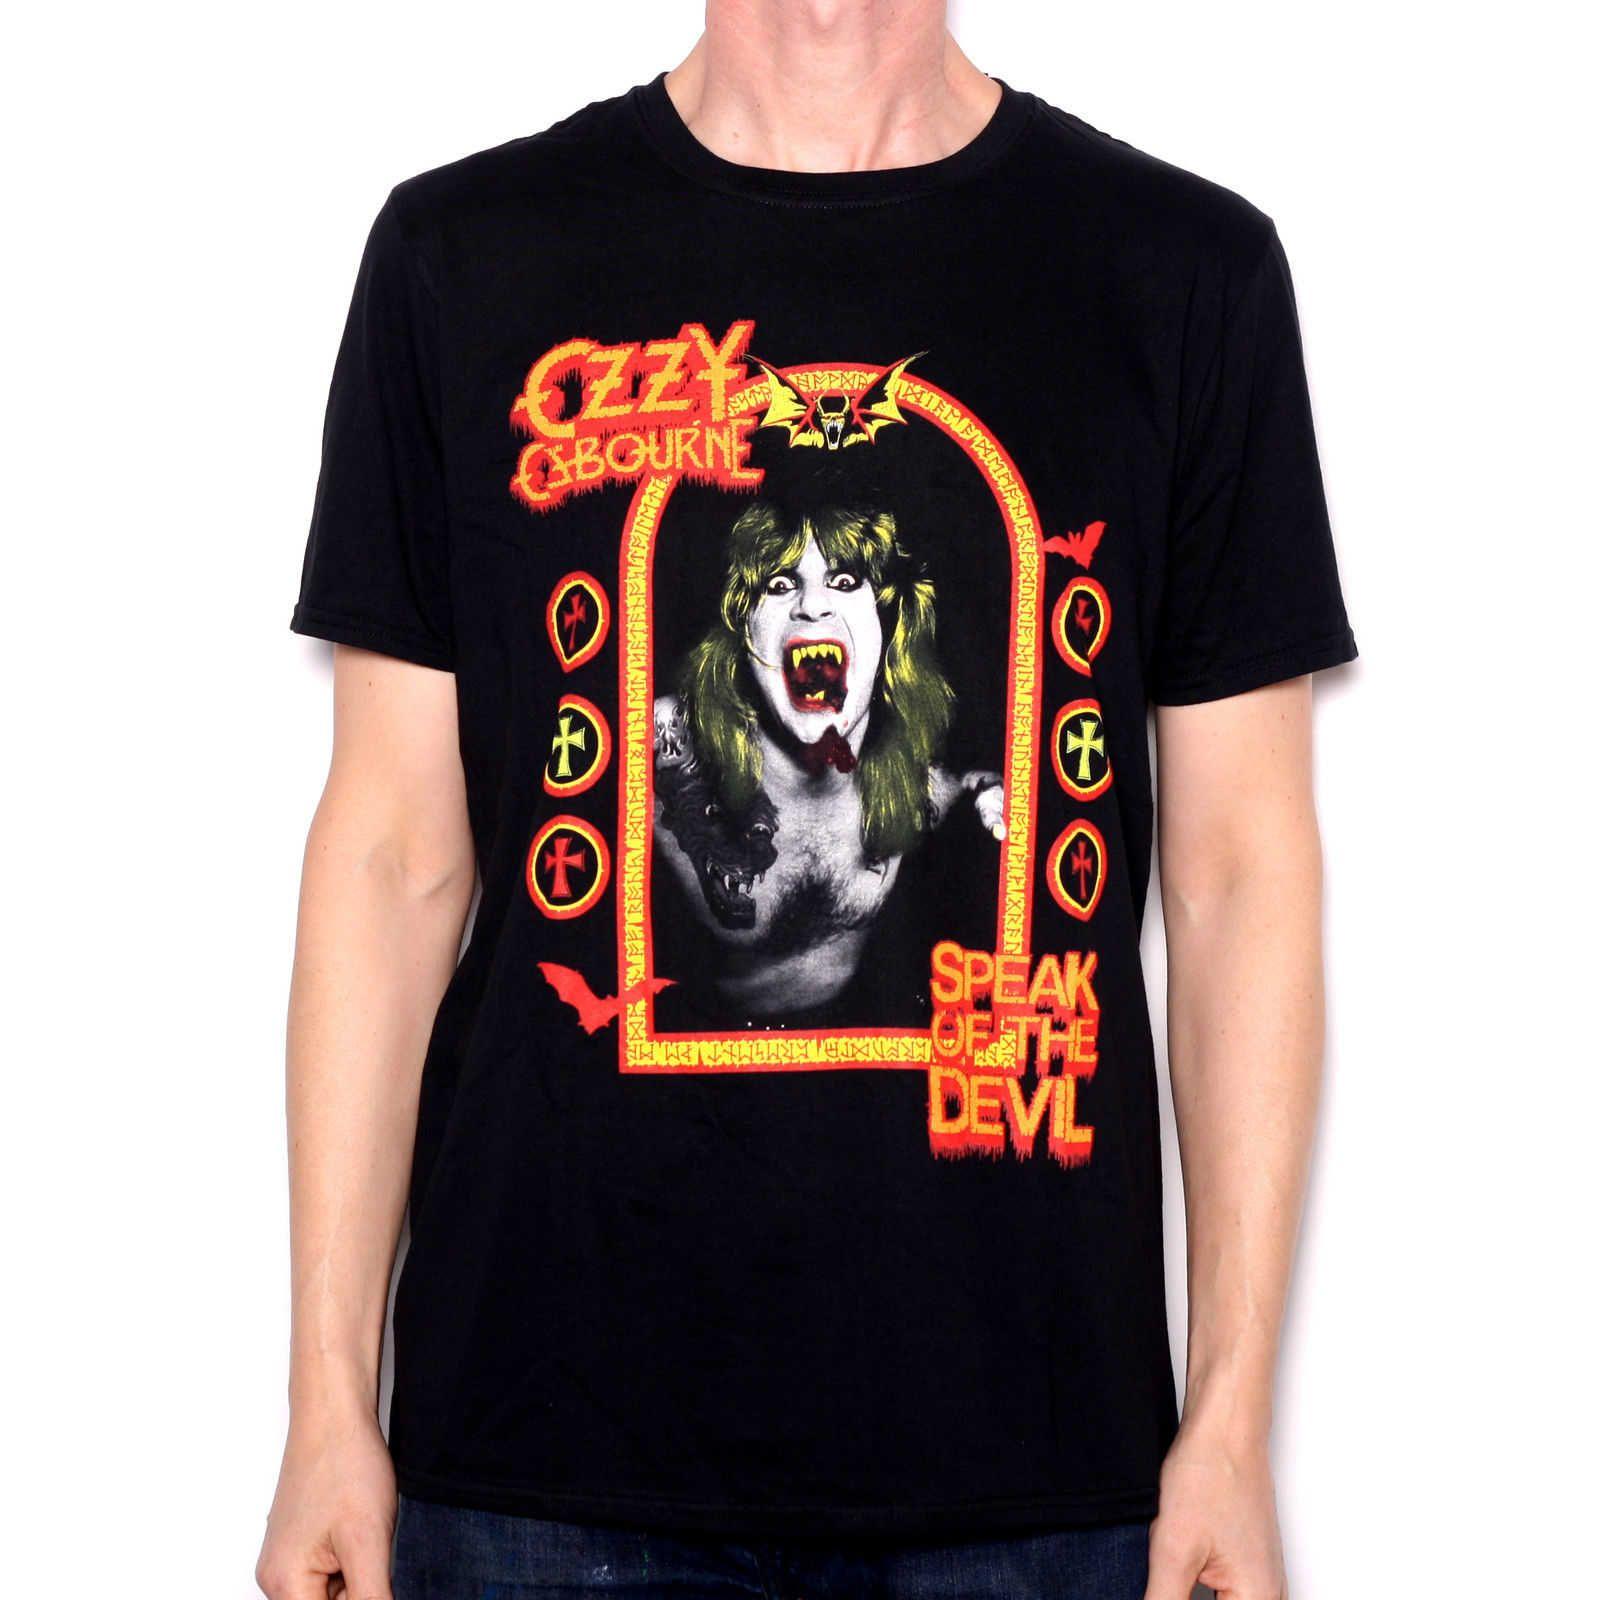 ab825a17f1d Ozzy Osborne T Shirt Speak Of The Devil 100% Official Black Sabbath Cult  Rock Crazy T Shirts T Shirt Prints From Teezone